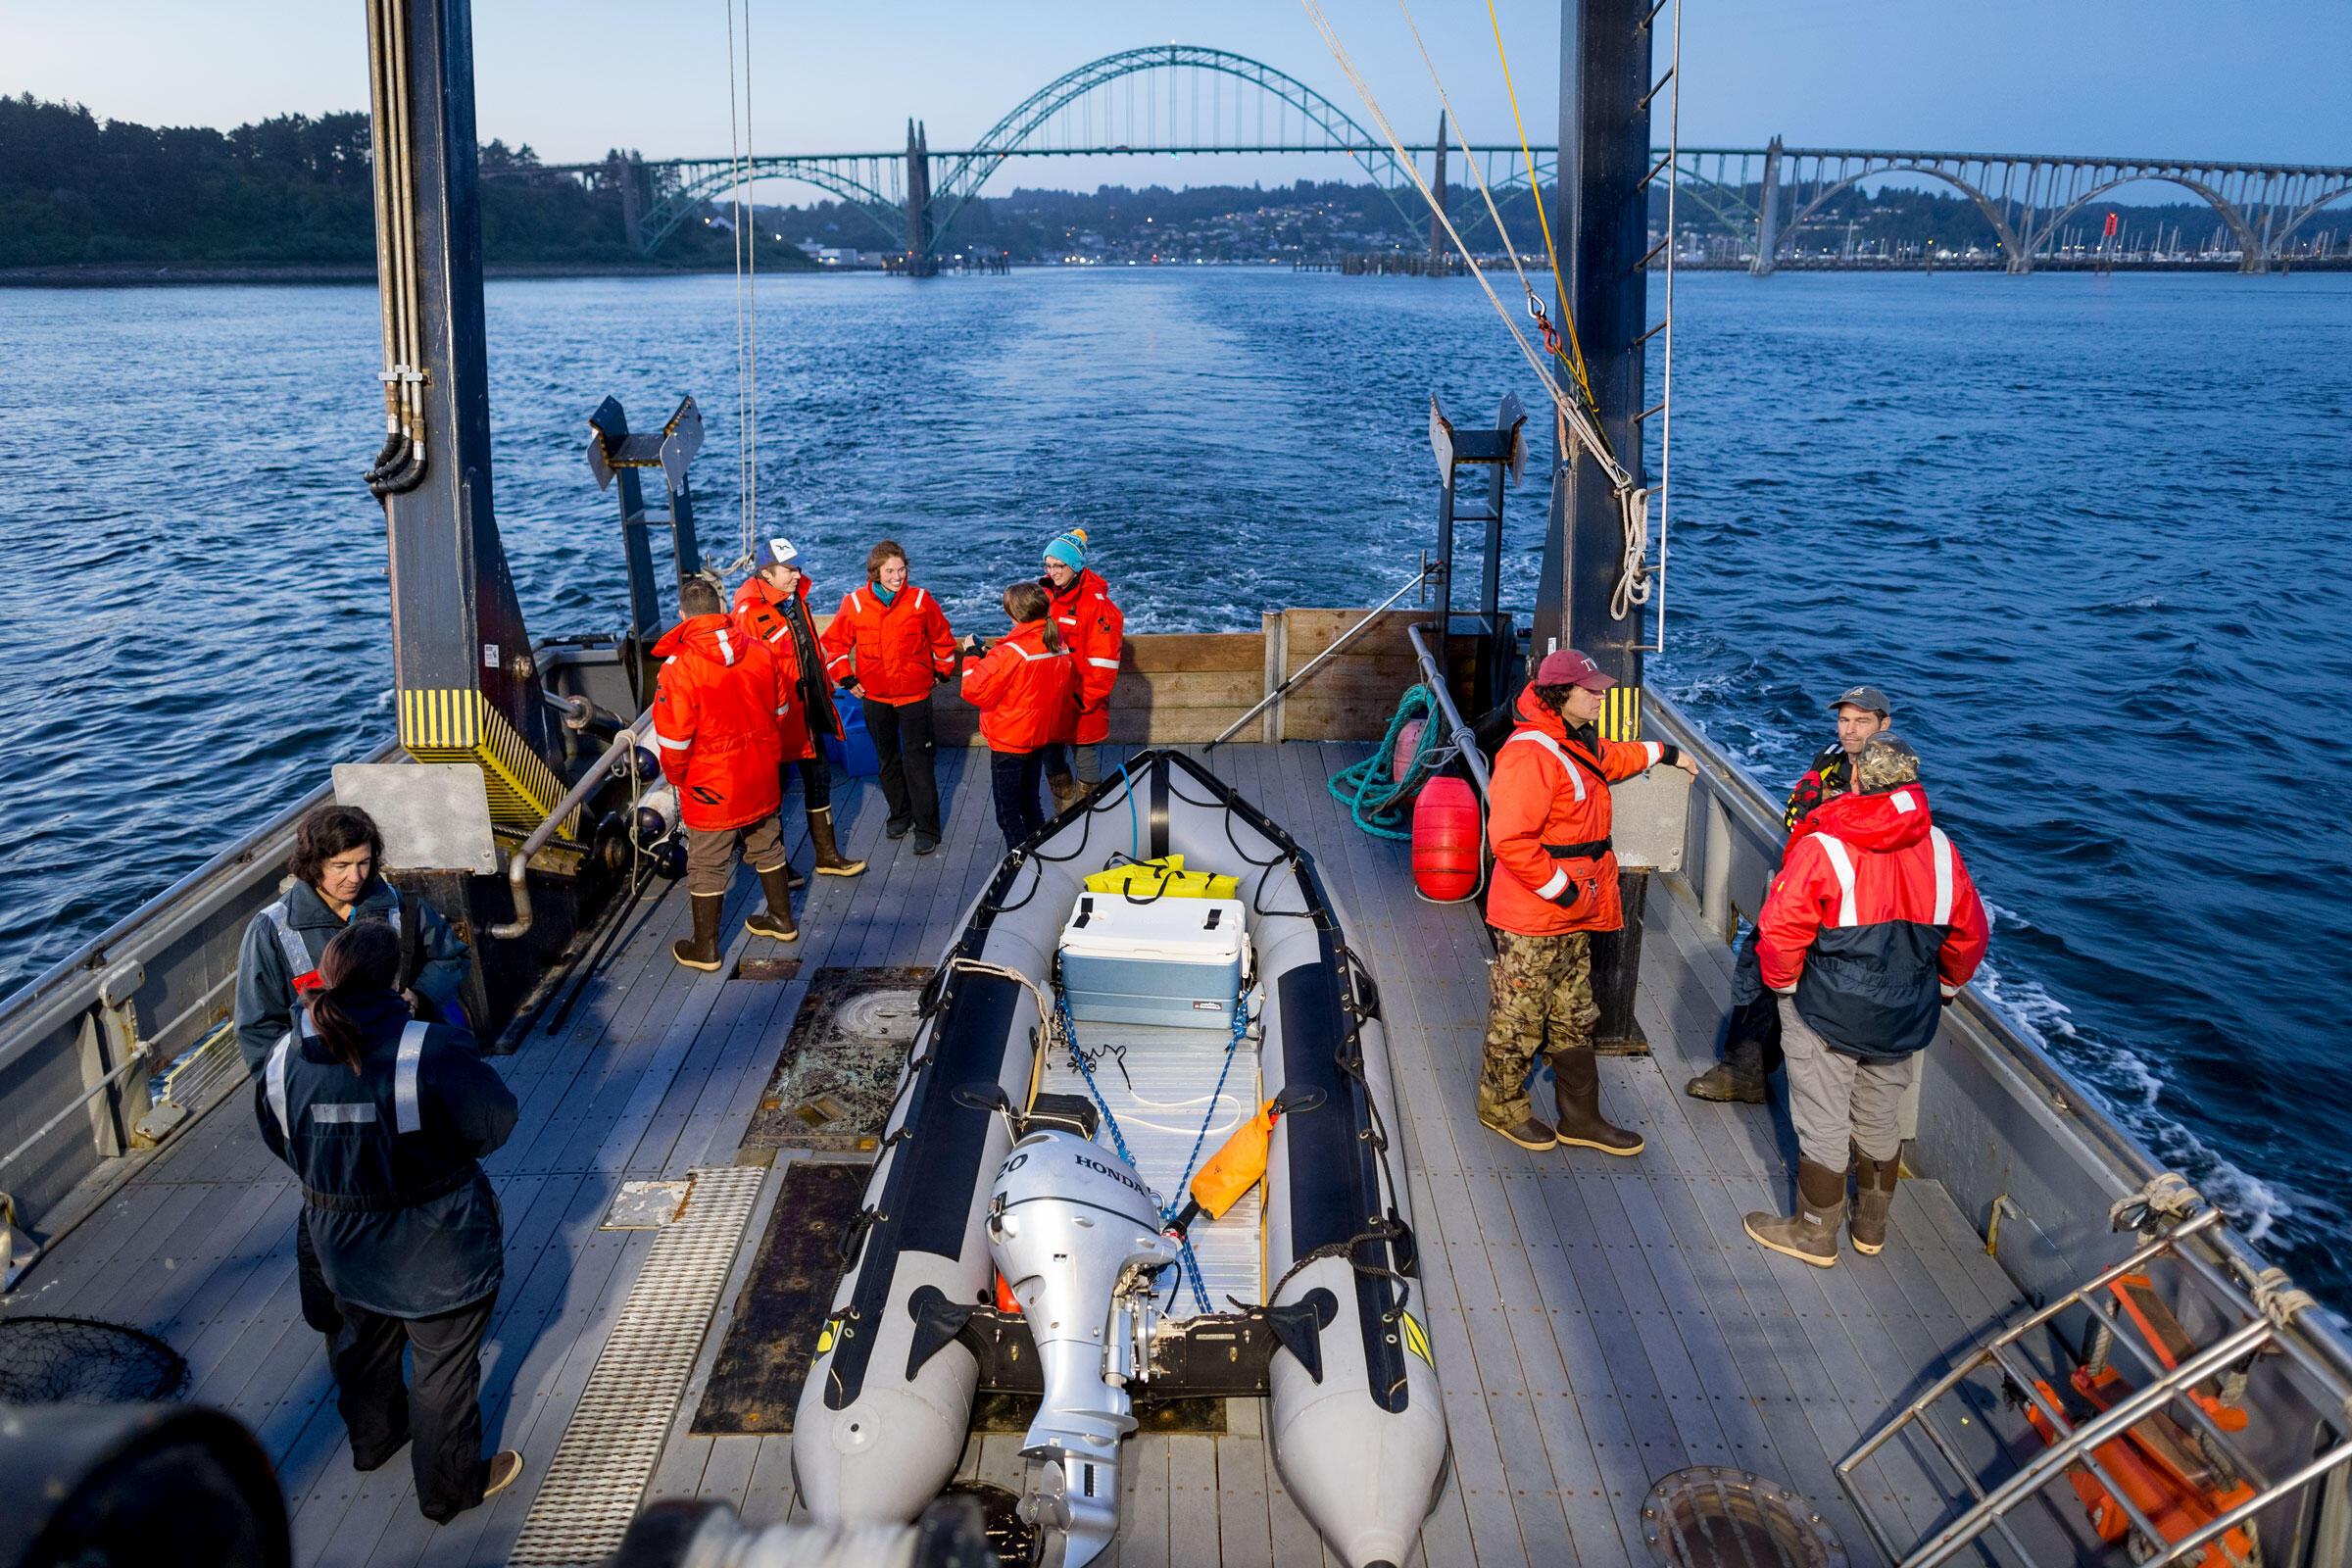 The elite seabird team sets off on the Pacific Storm from Newport, Oregon. Jaymi Heimbuch